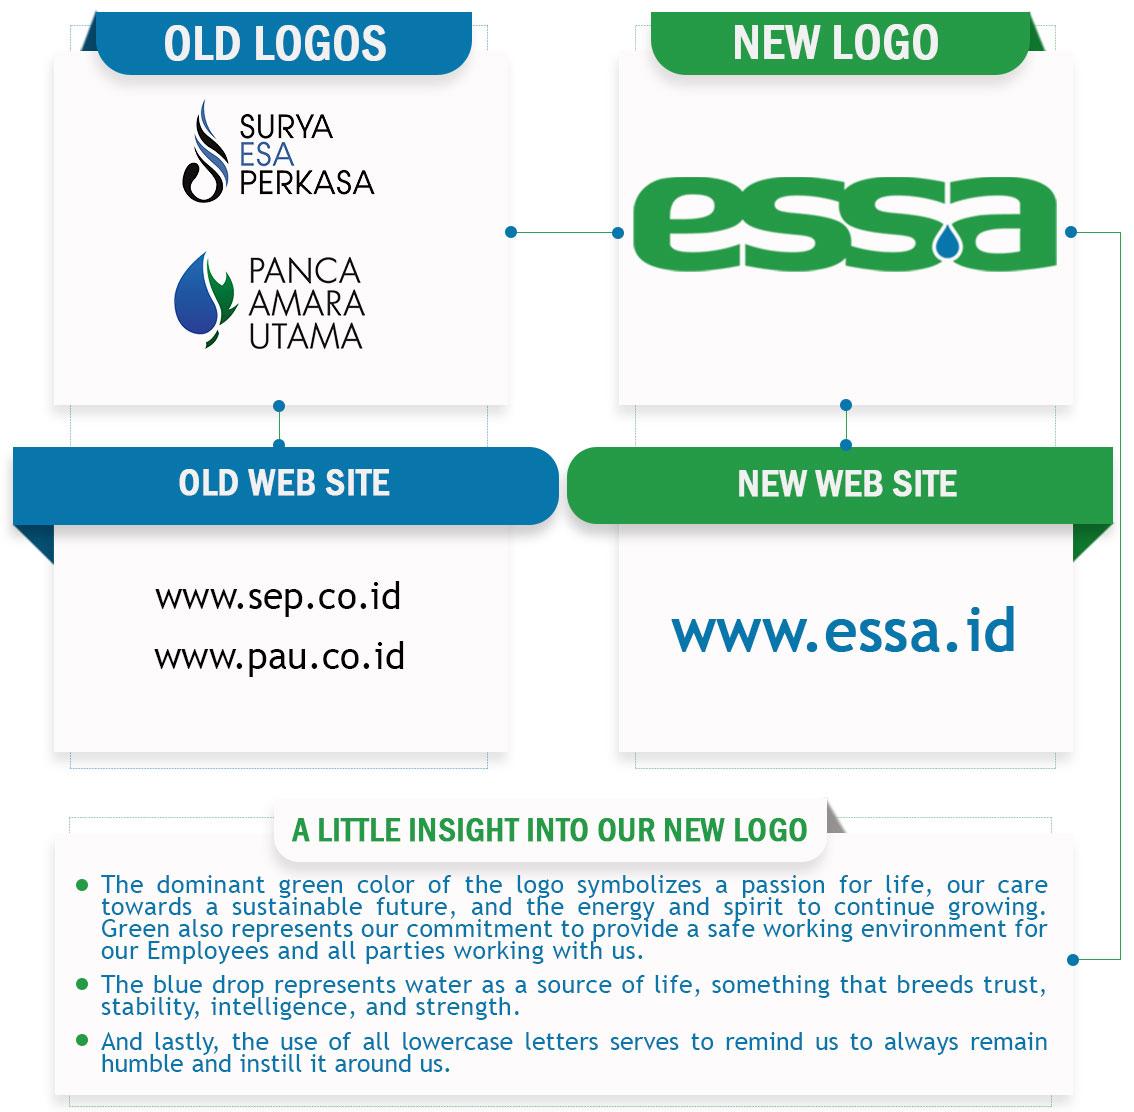 ESSA new brand identity